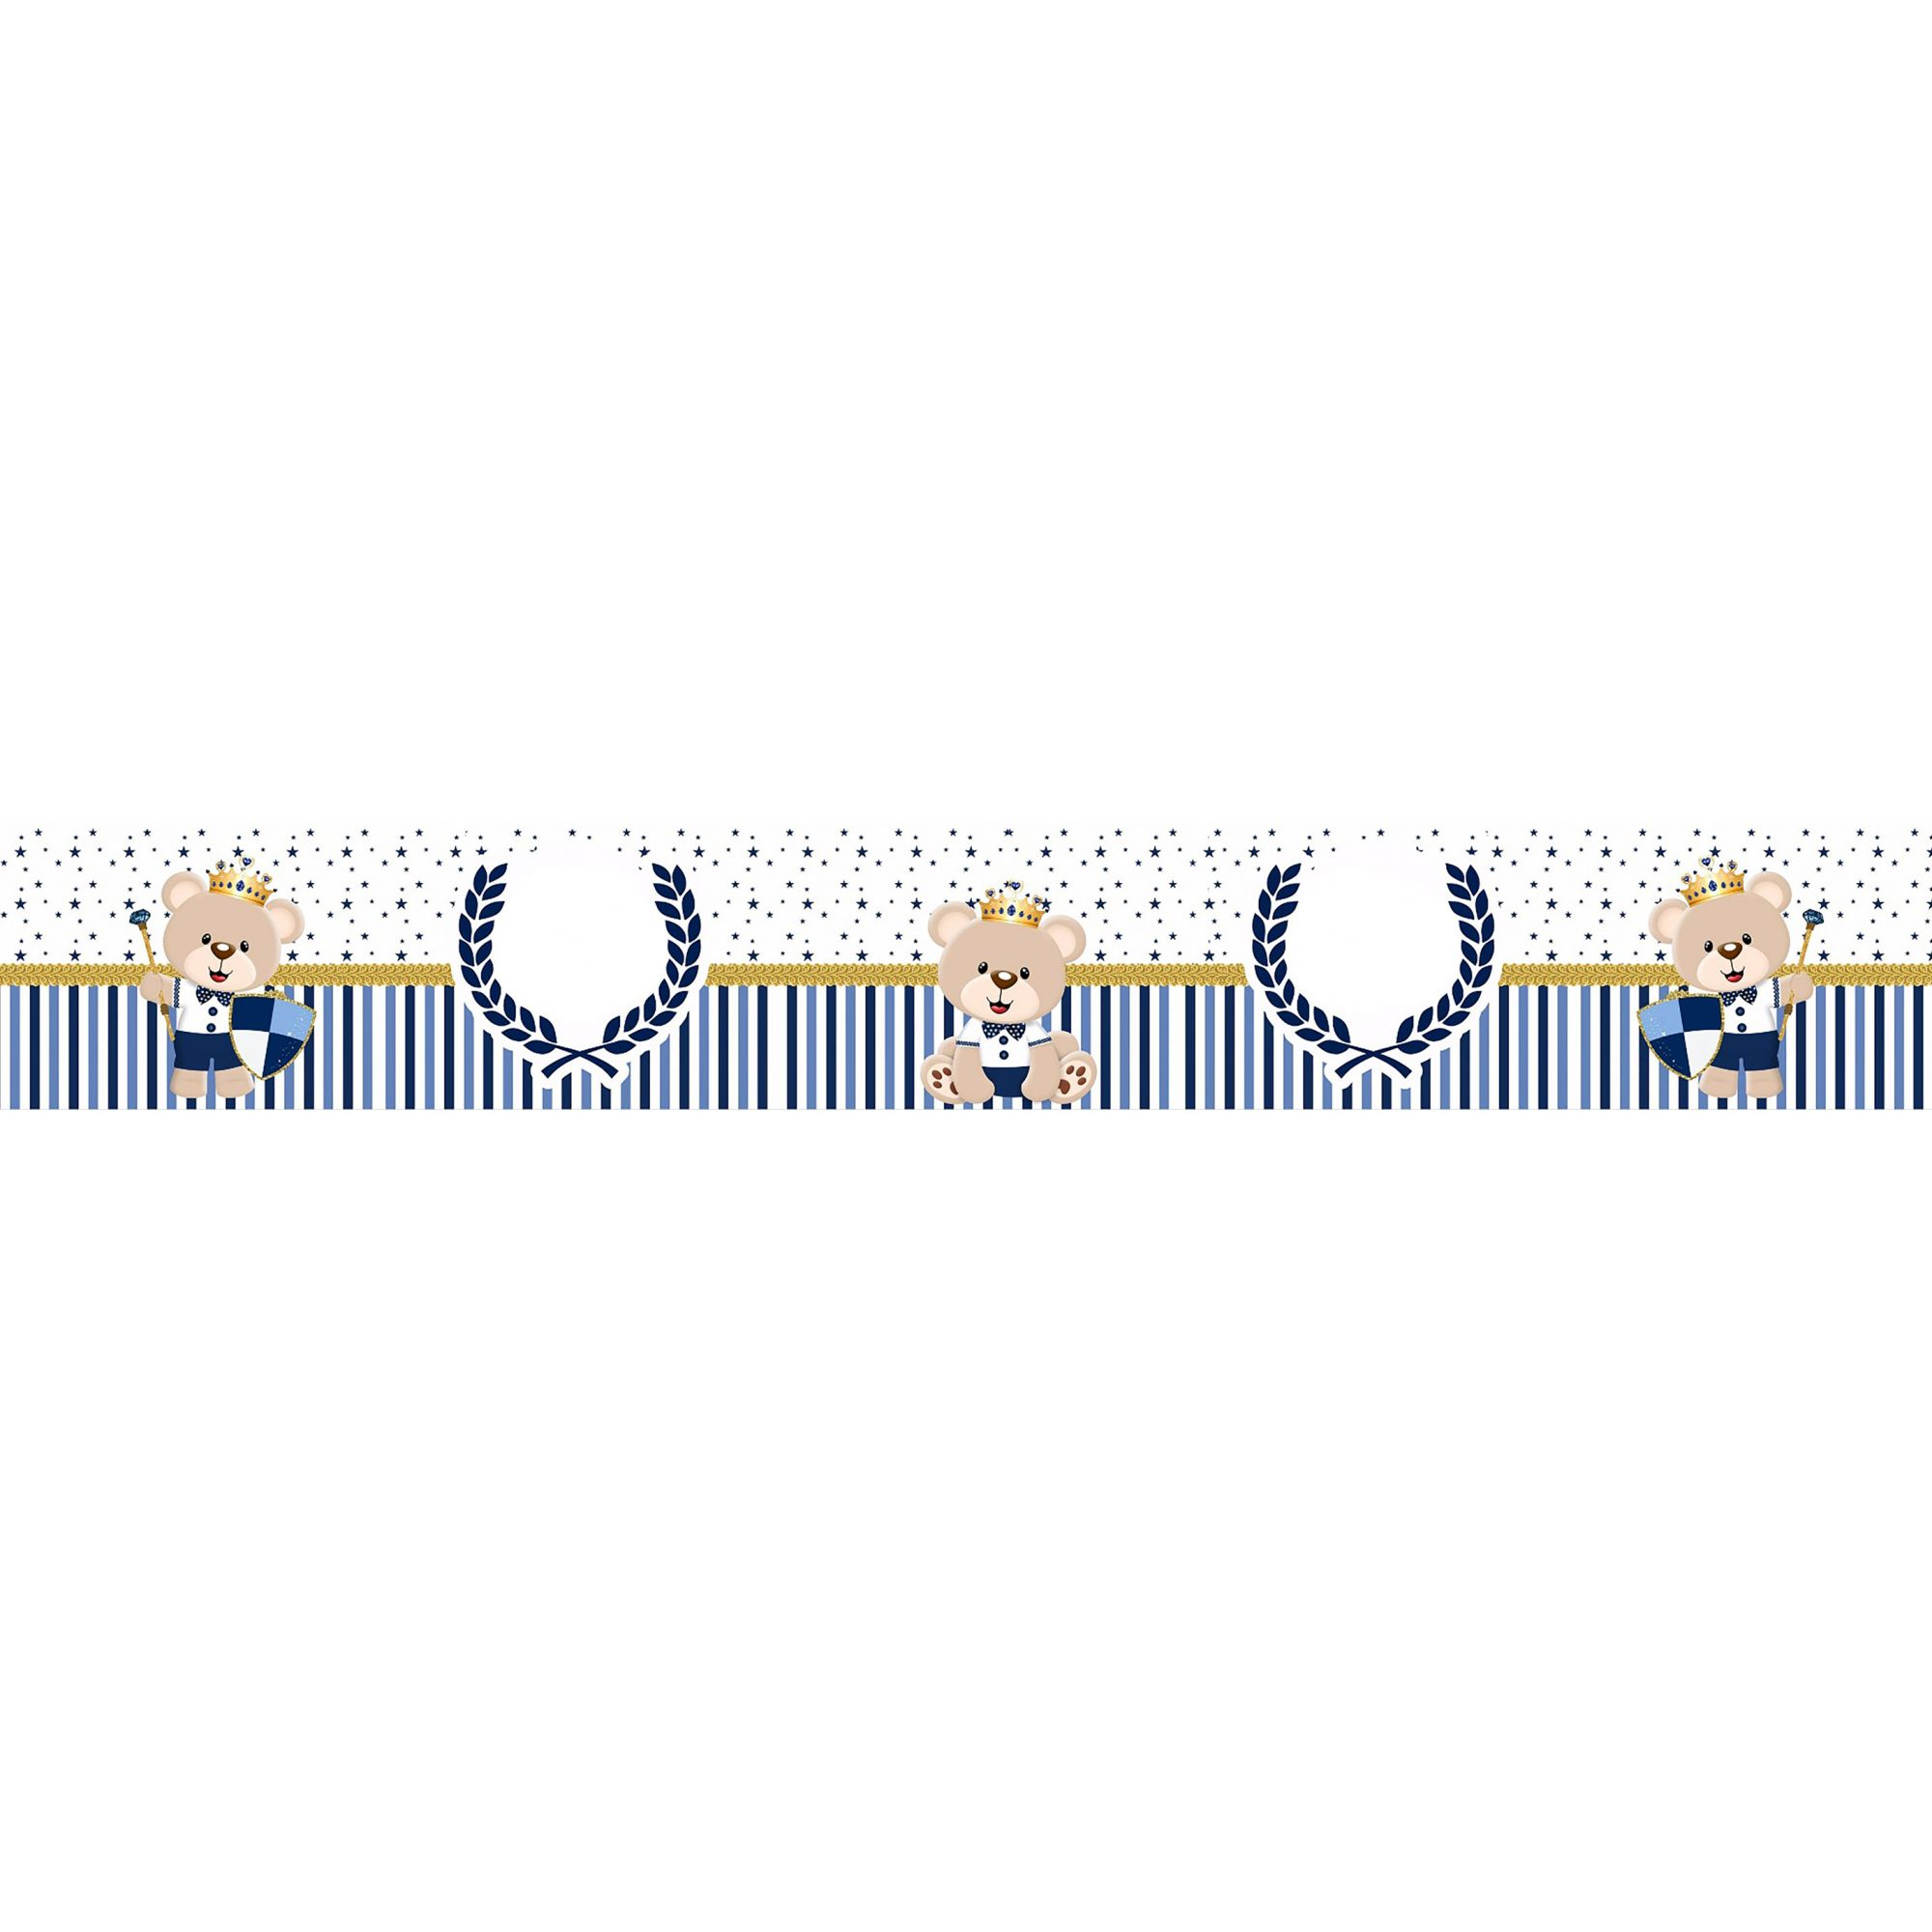 Faixa Decorativa Adesiva Ursinho Rei Principe  - Final Decor